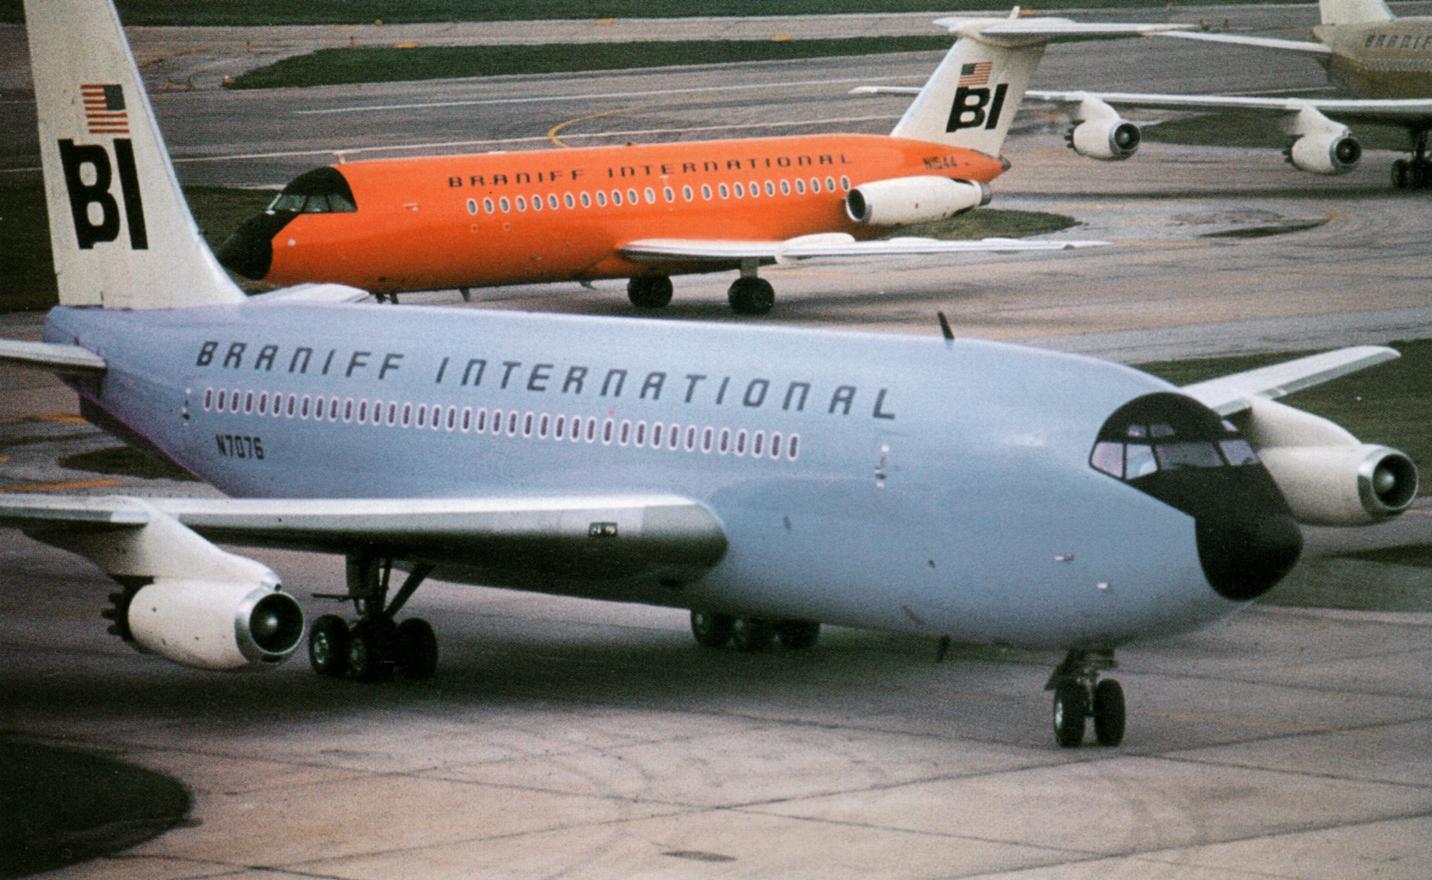 Braniff-planes-colorfulls